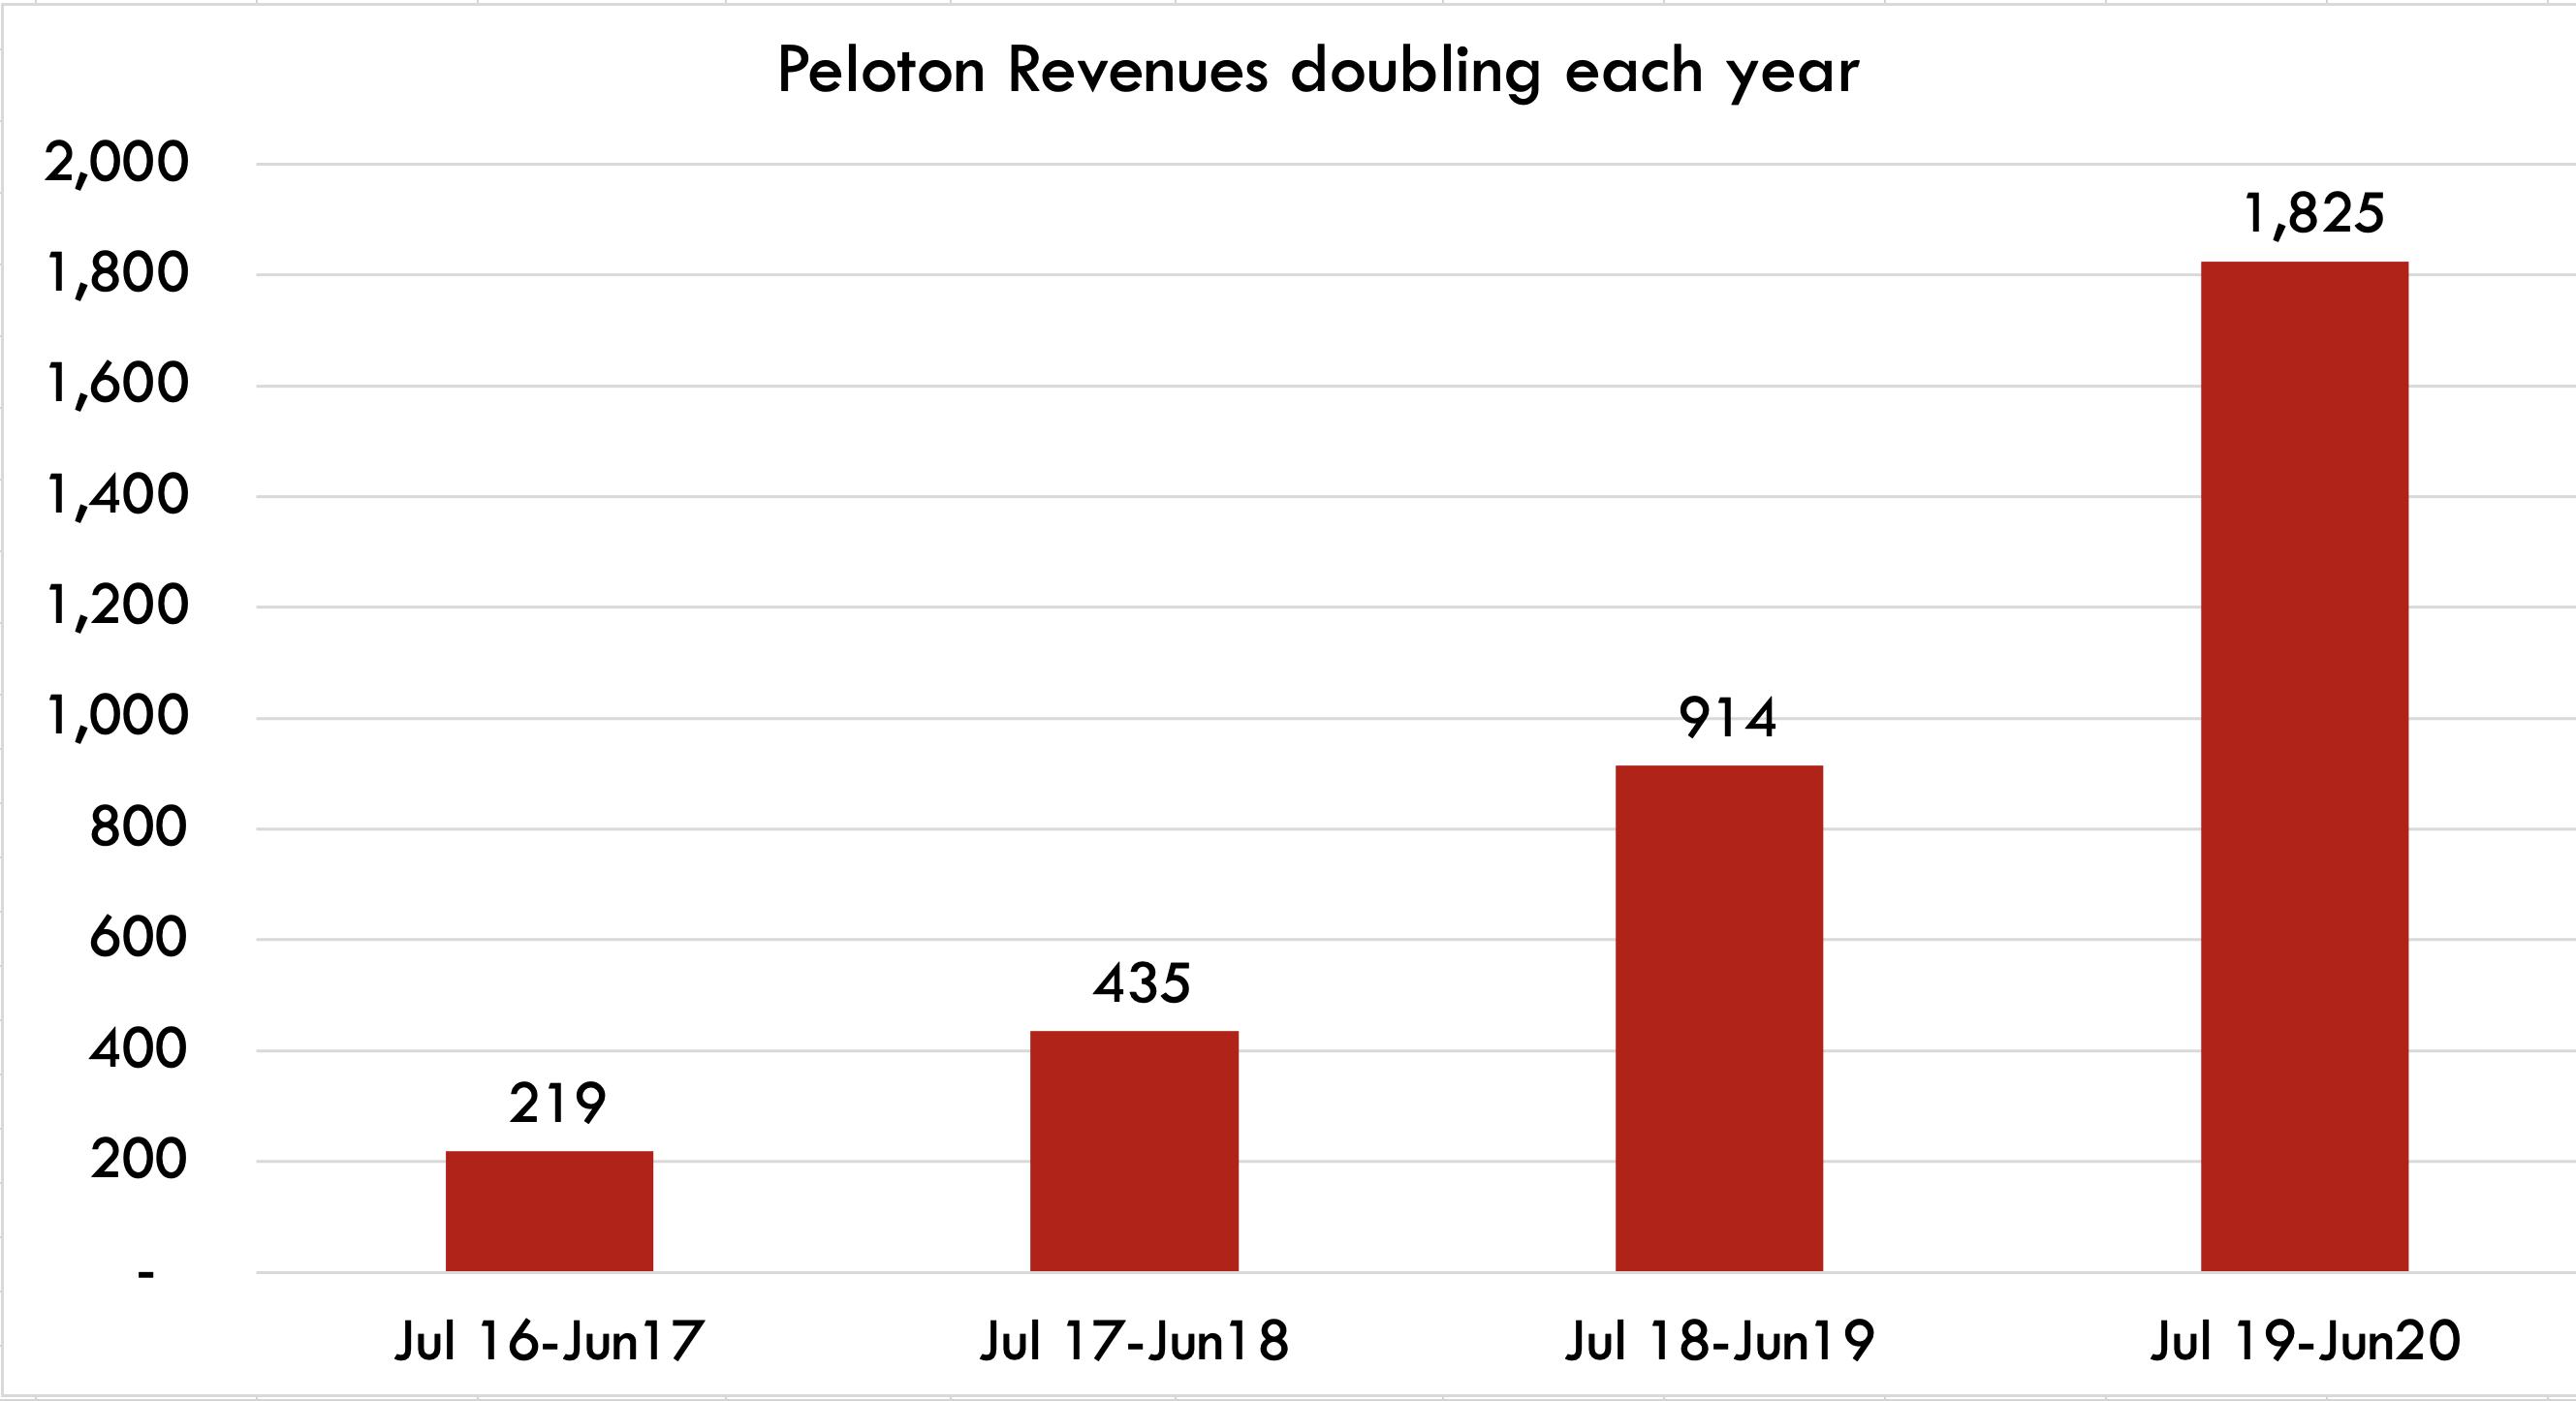 Peloton revenue growth